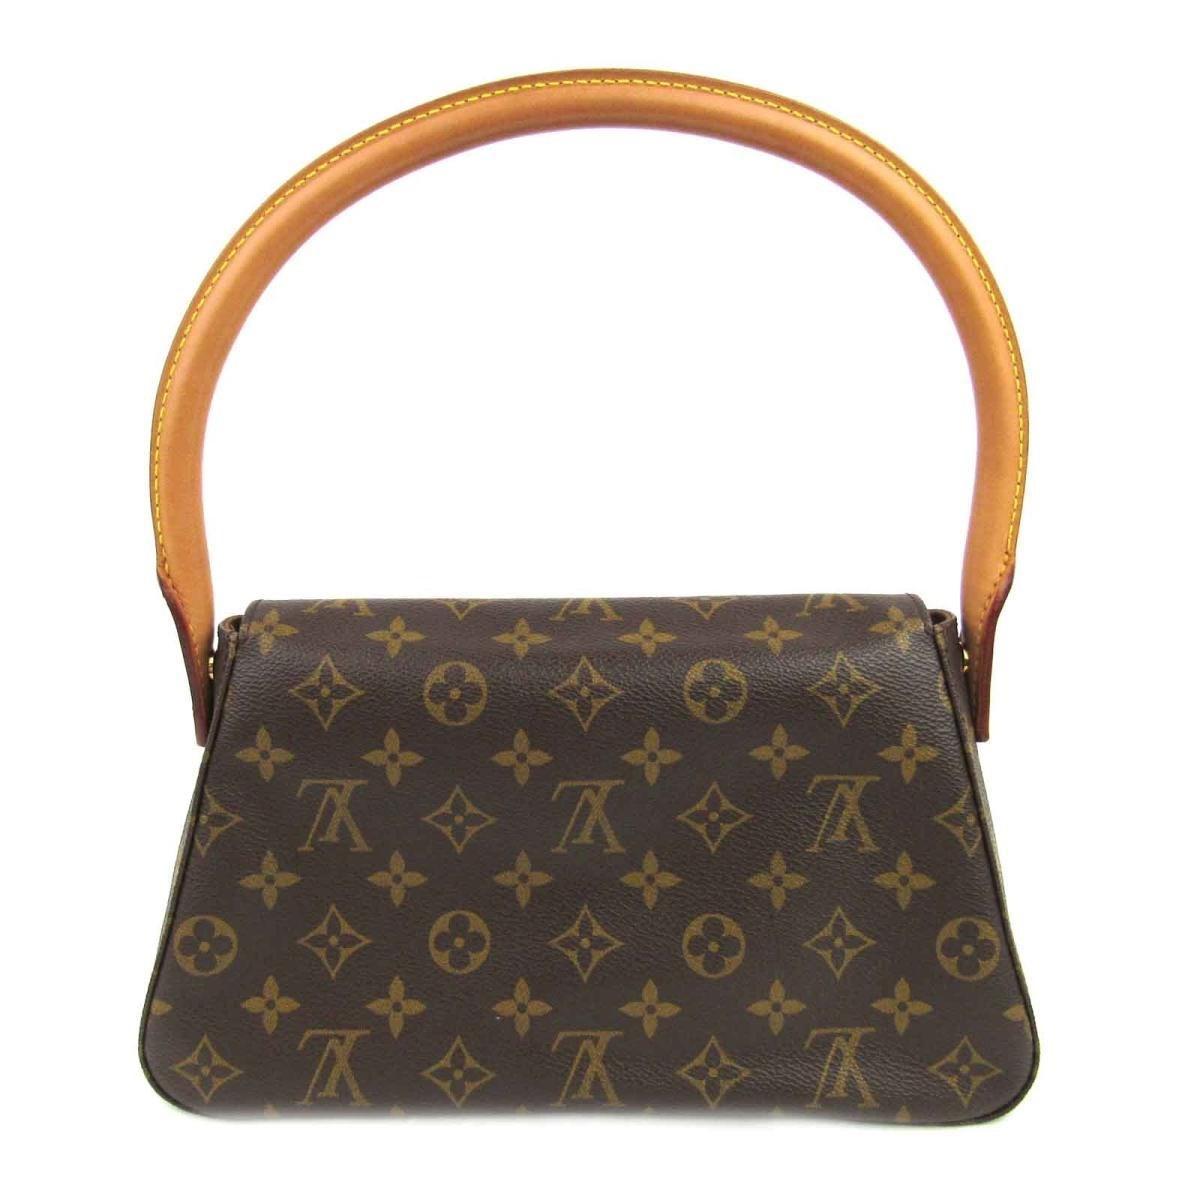 151f1529ed2c5 Louis Vuitton - Brown Authentic Mini Looping Flap Shoulder Bag Monogram  Canvas M51147 - Lyst. View fullscreen